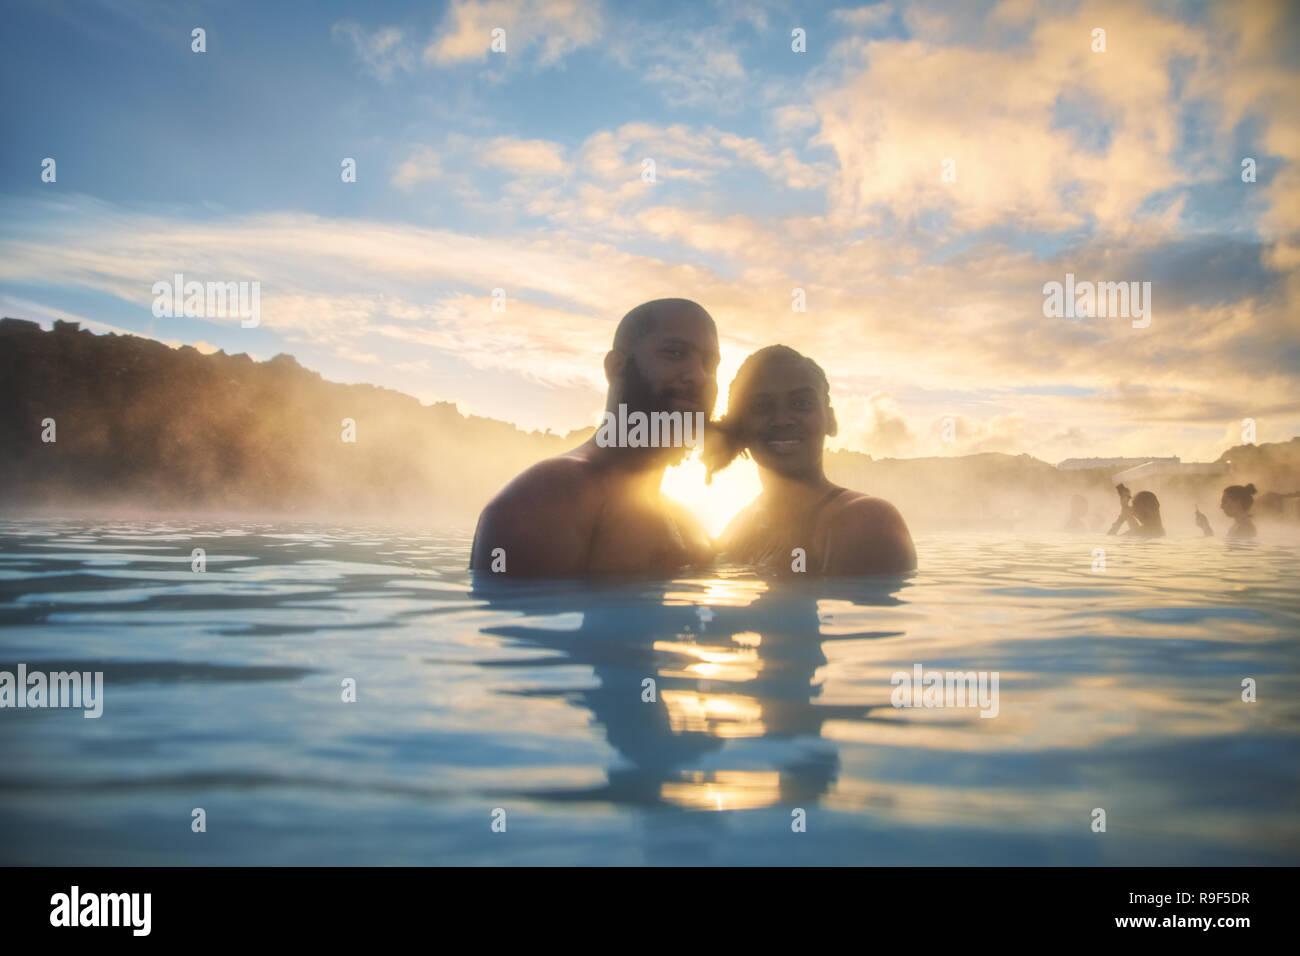 Couple love heart enjoy thermal springs hot warm bath pool Iceland Blue Lagoon - Stock Image